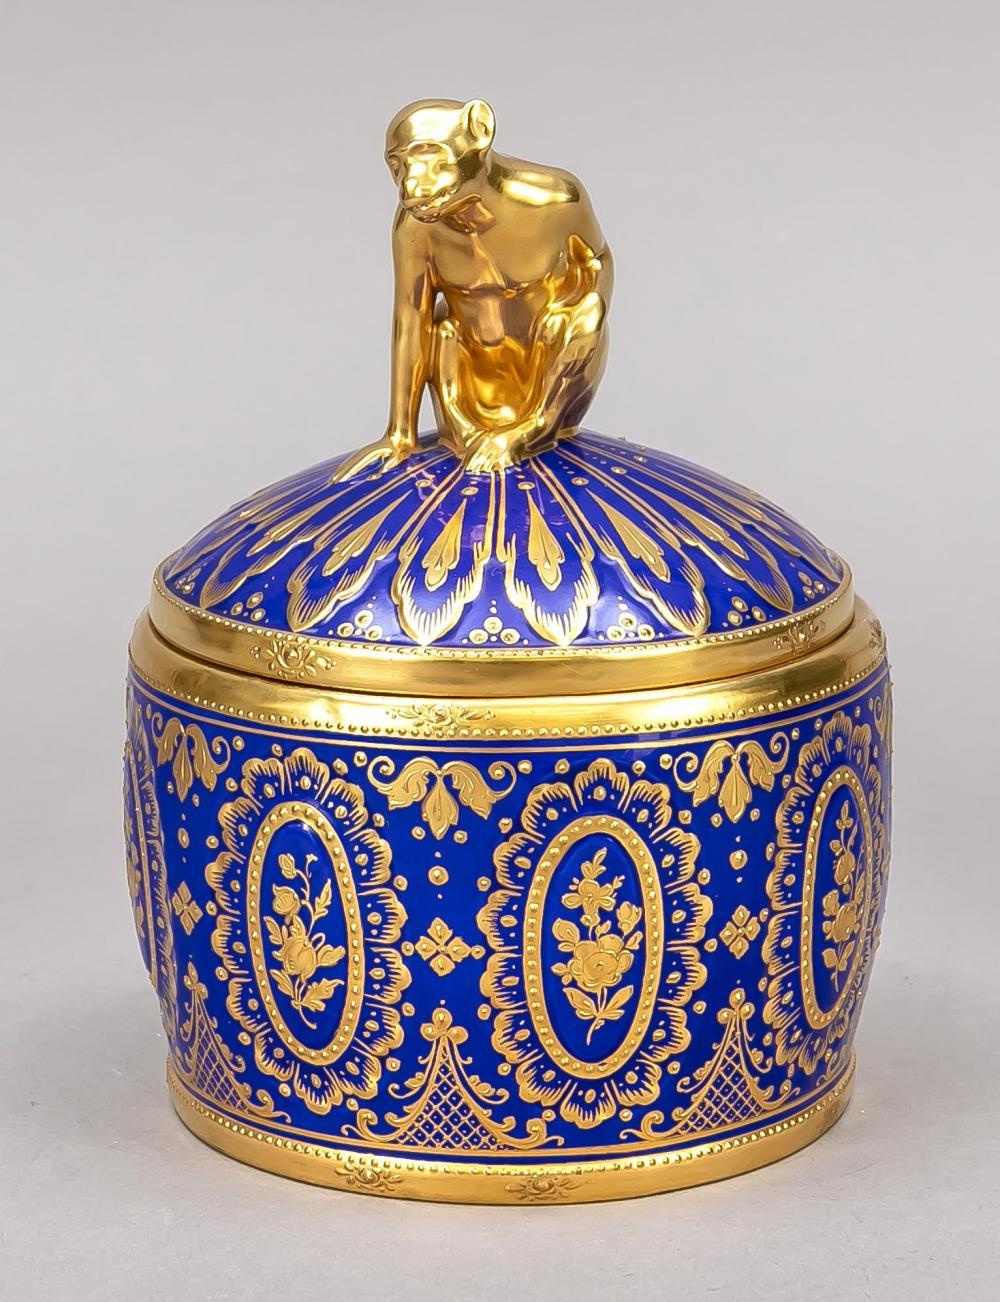 Round lidded box, Ambrosius La